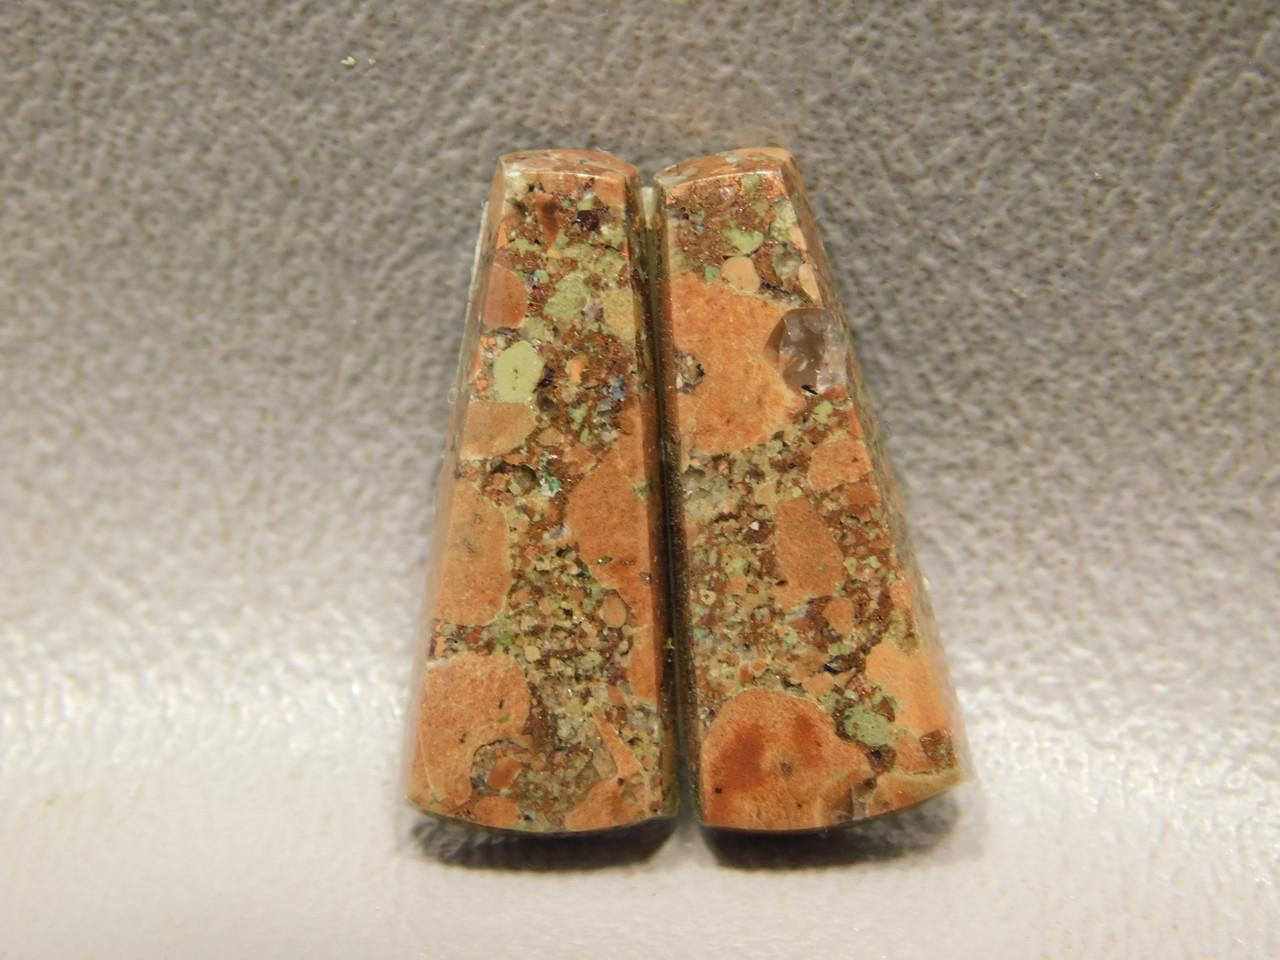 Copper Rose Semi Precious Gemstone Matched Pair Cabochons #9